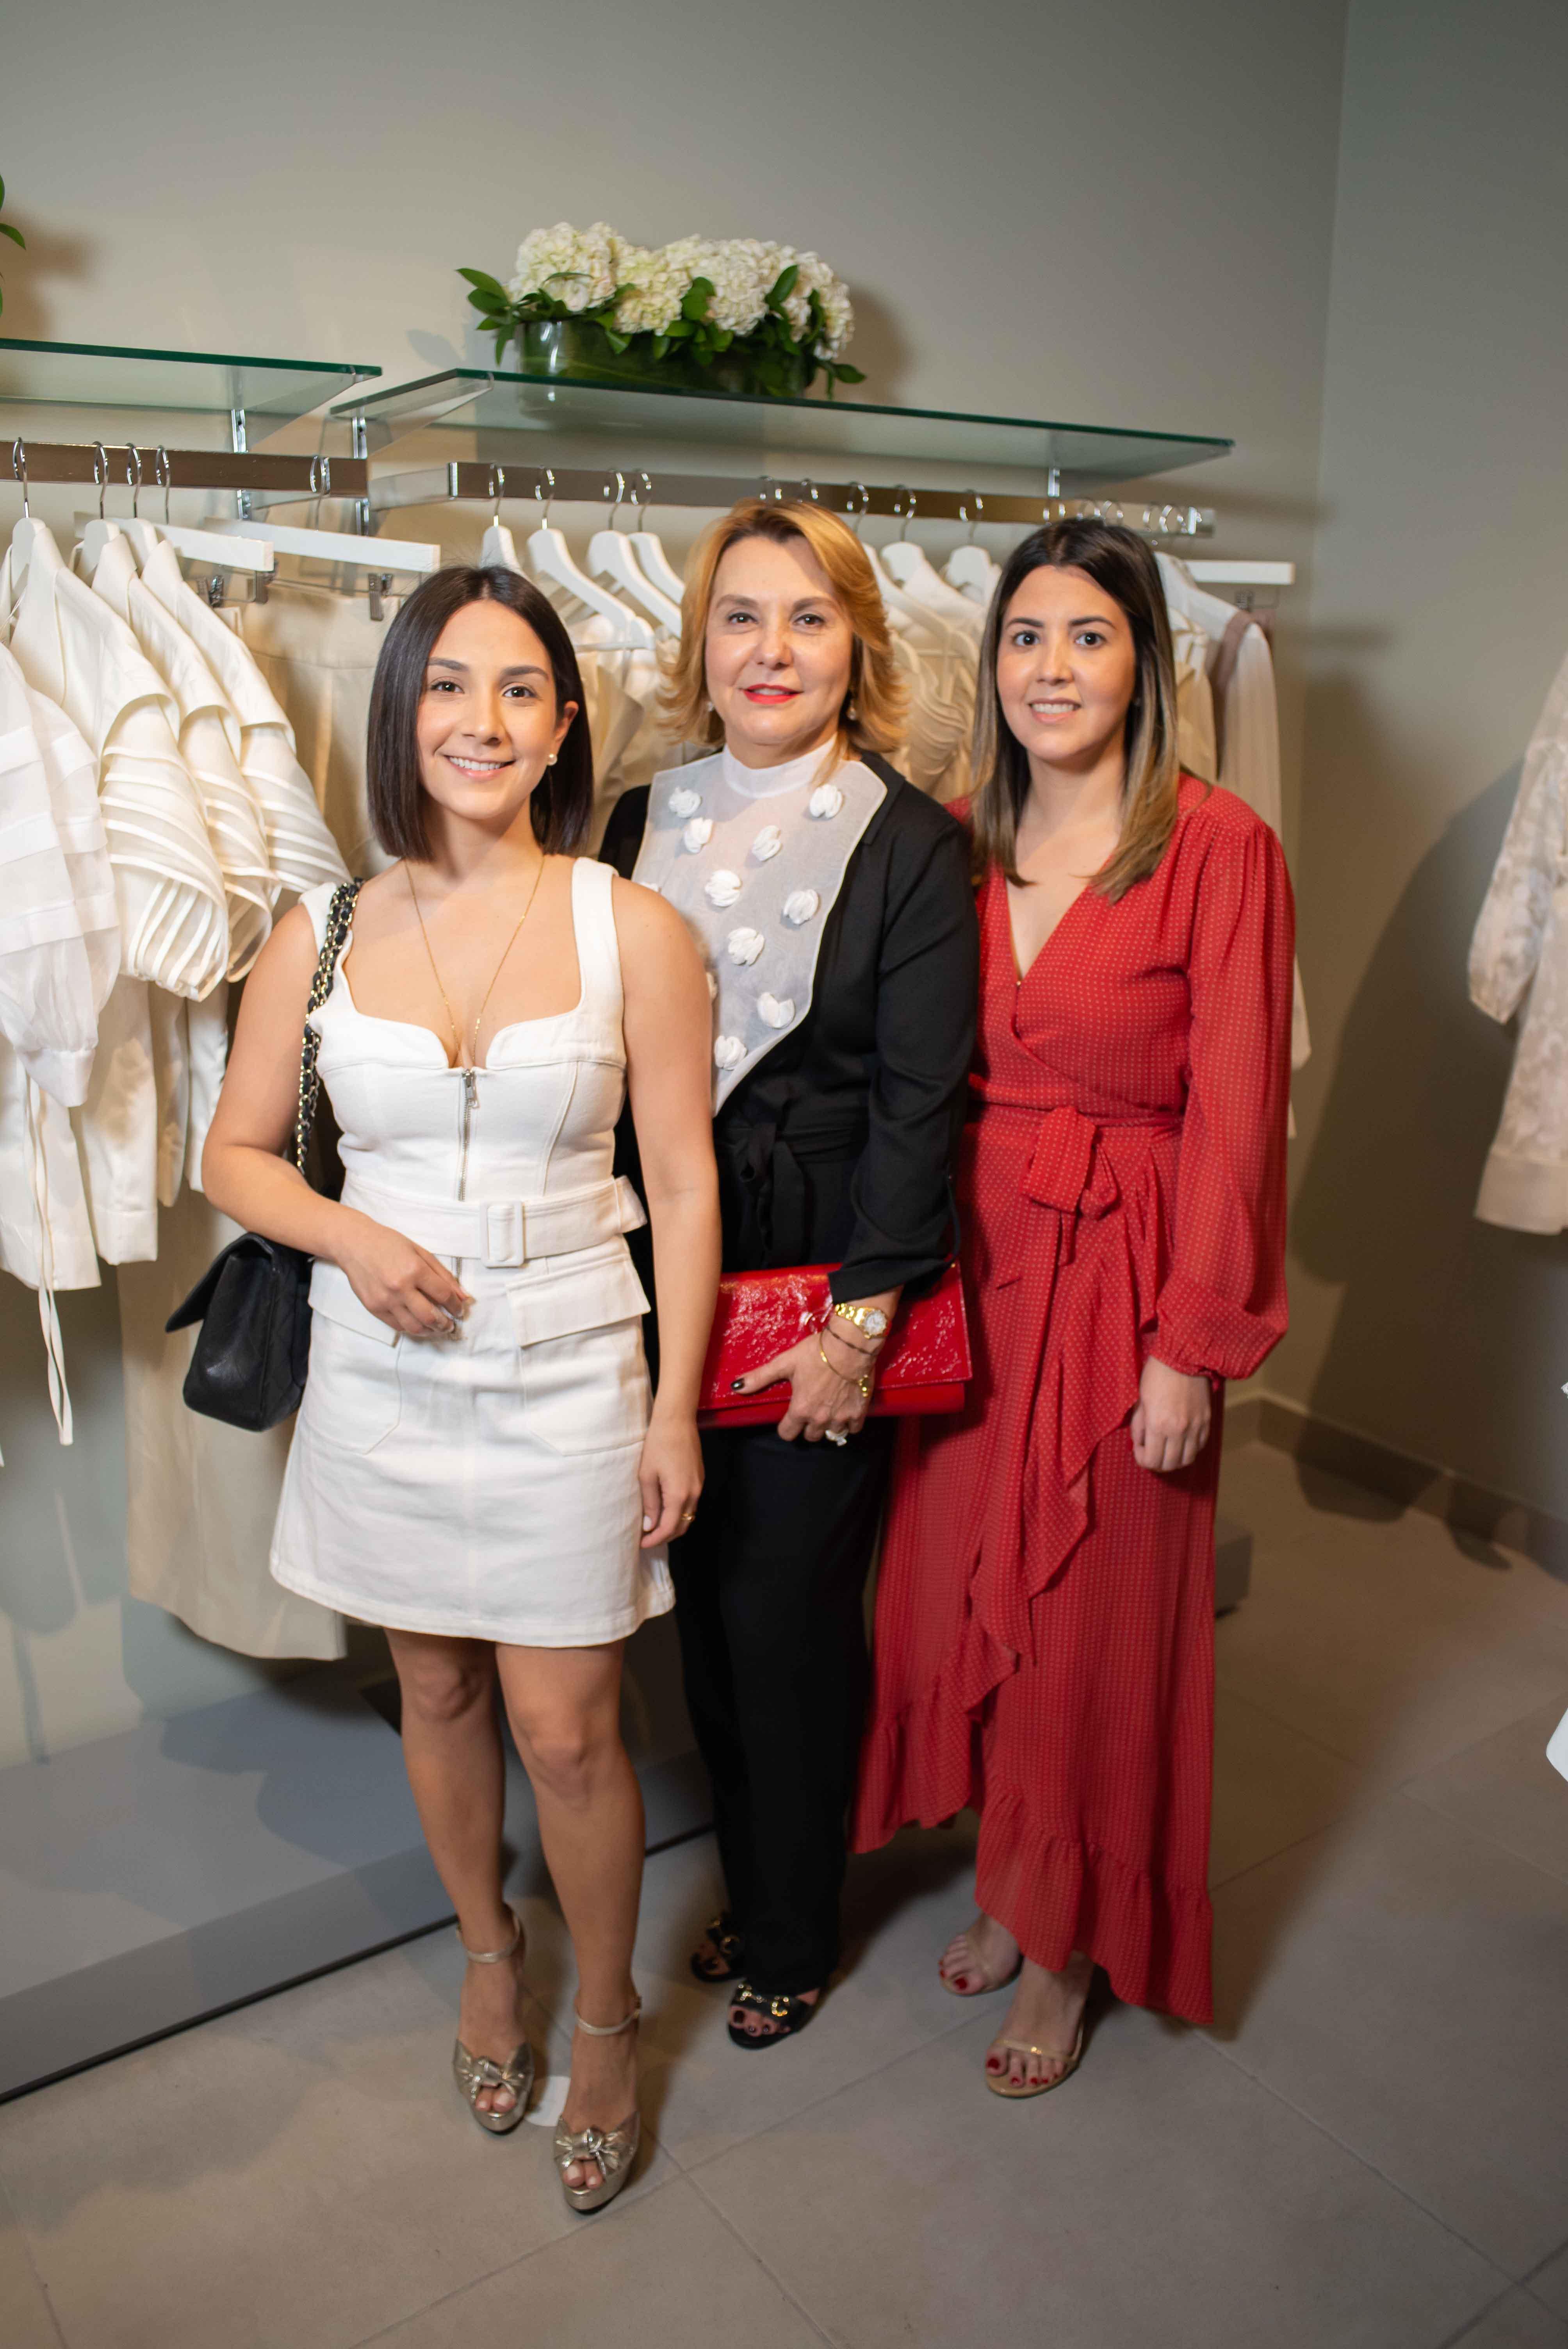 12. Diane Santana, Bronis de Sentana & Paola Santana